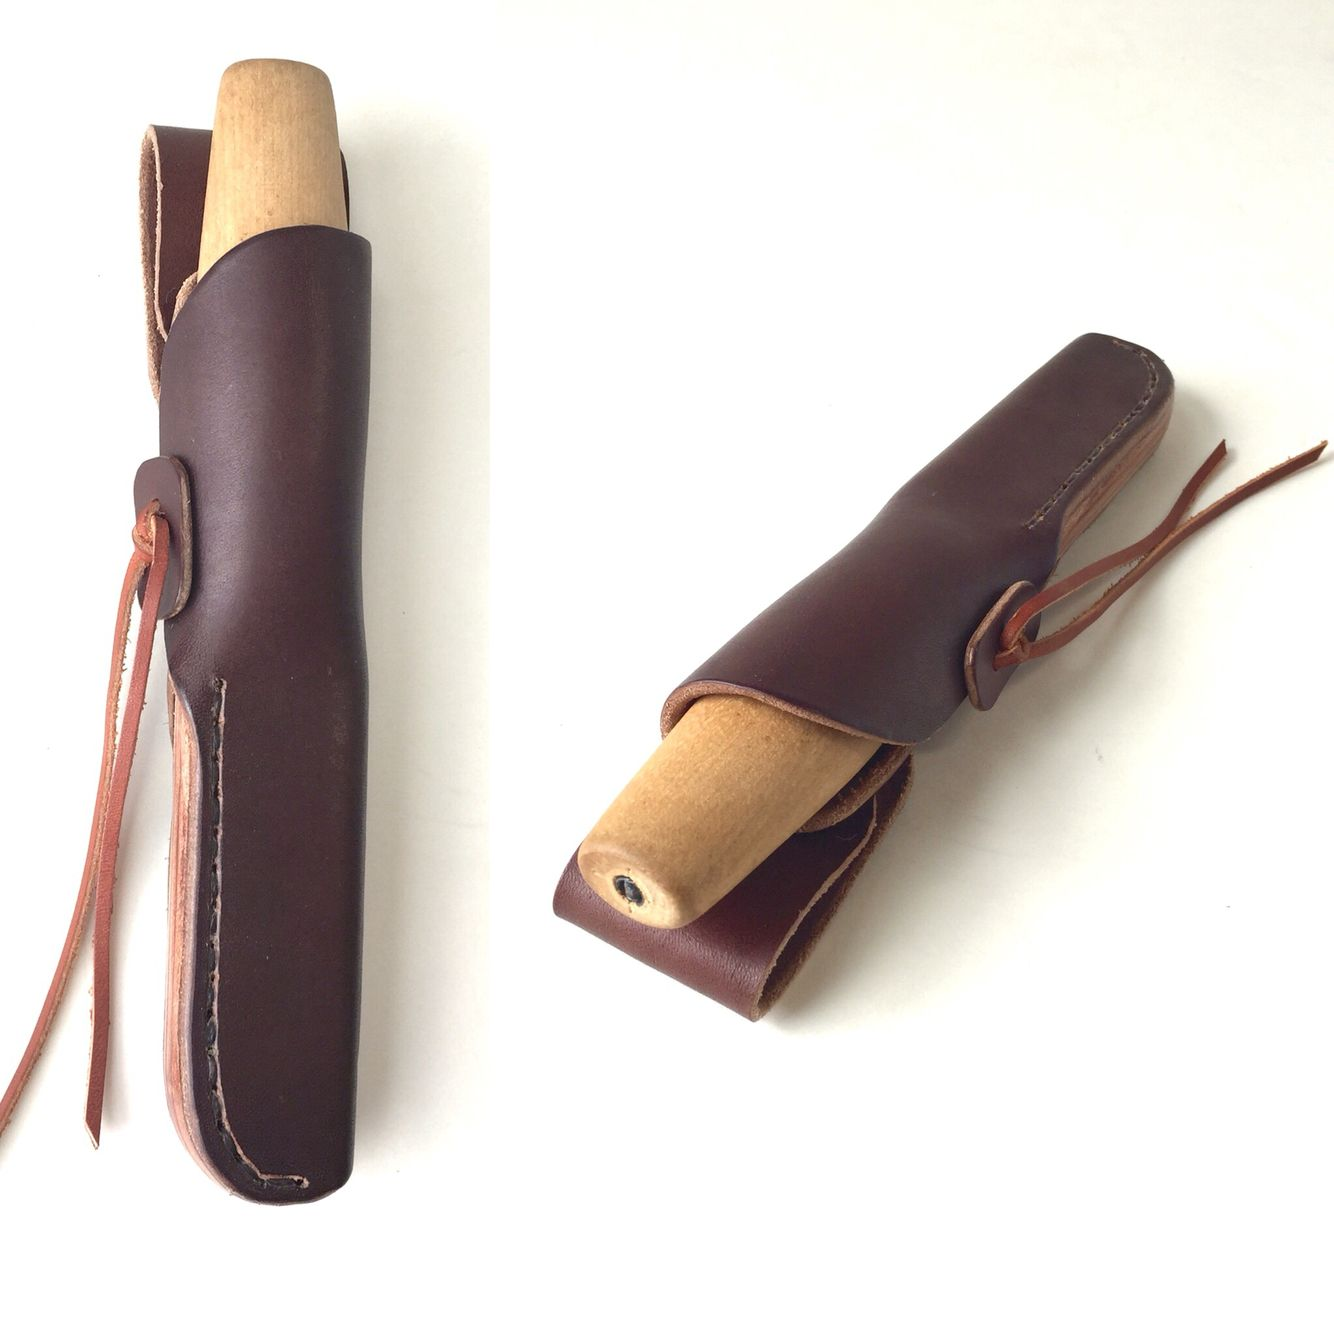 Erik Frost Mora Knife Sweden: Custom Leather Knife Sheath For Morakniv Erik Frost 106